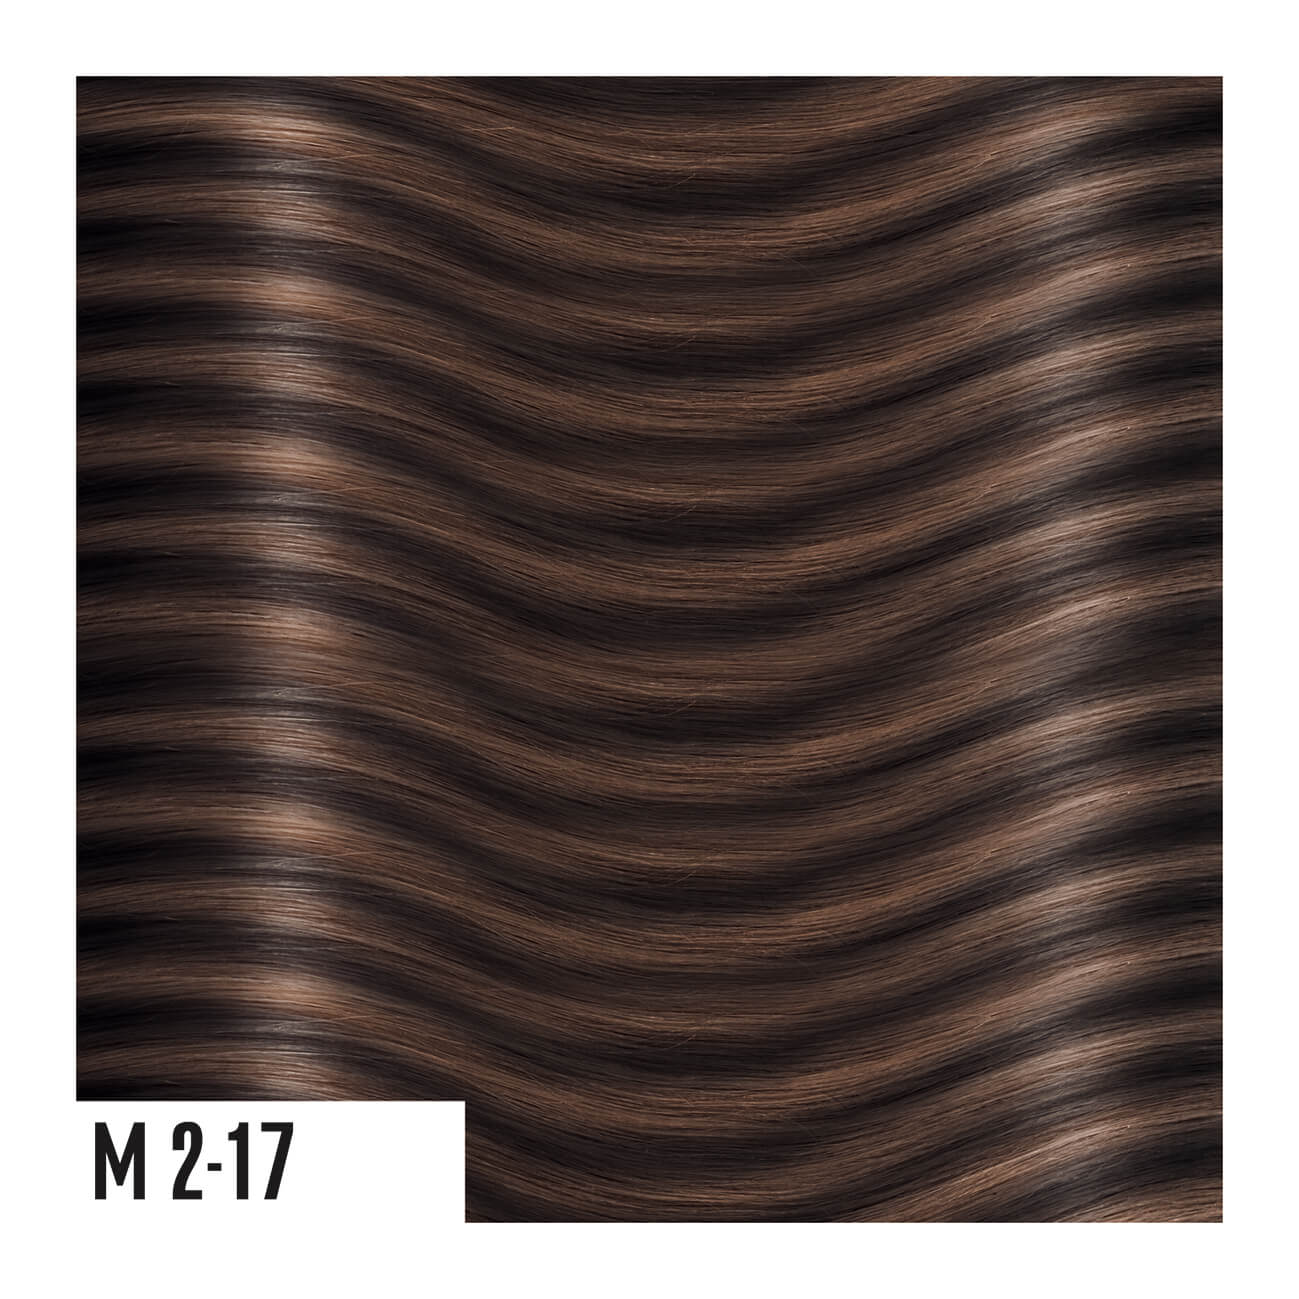 M2-17